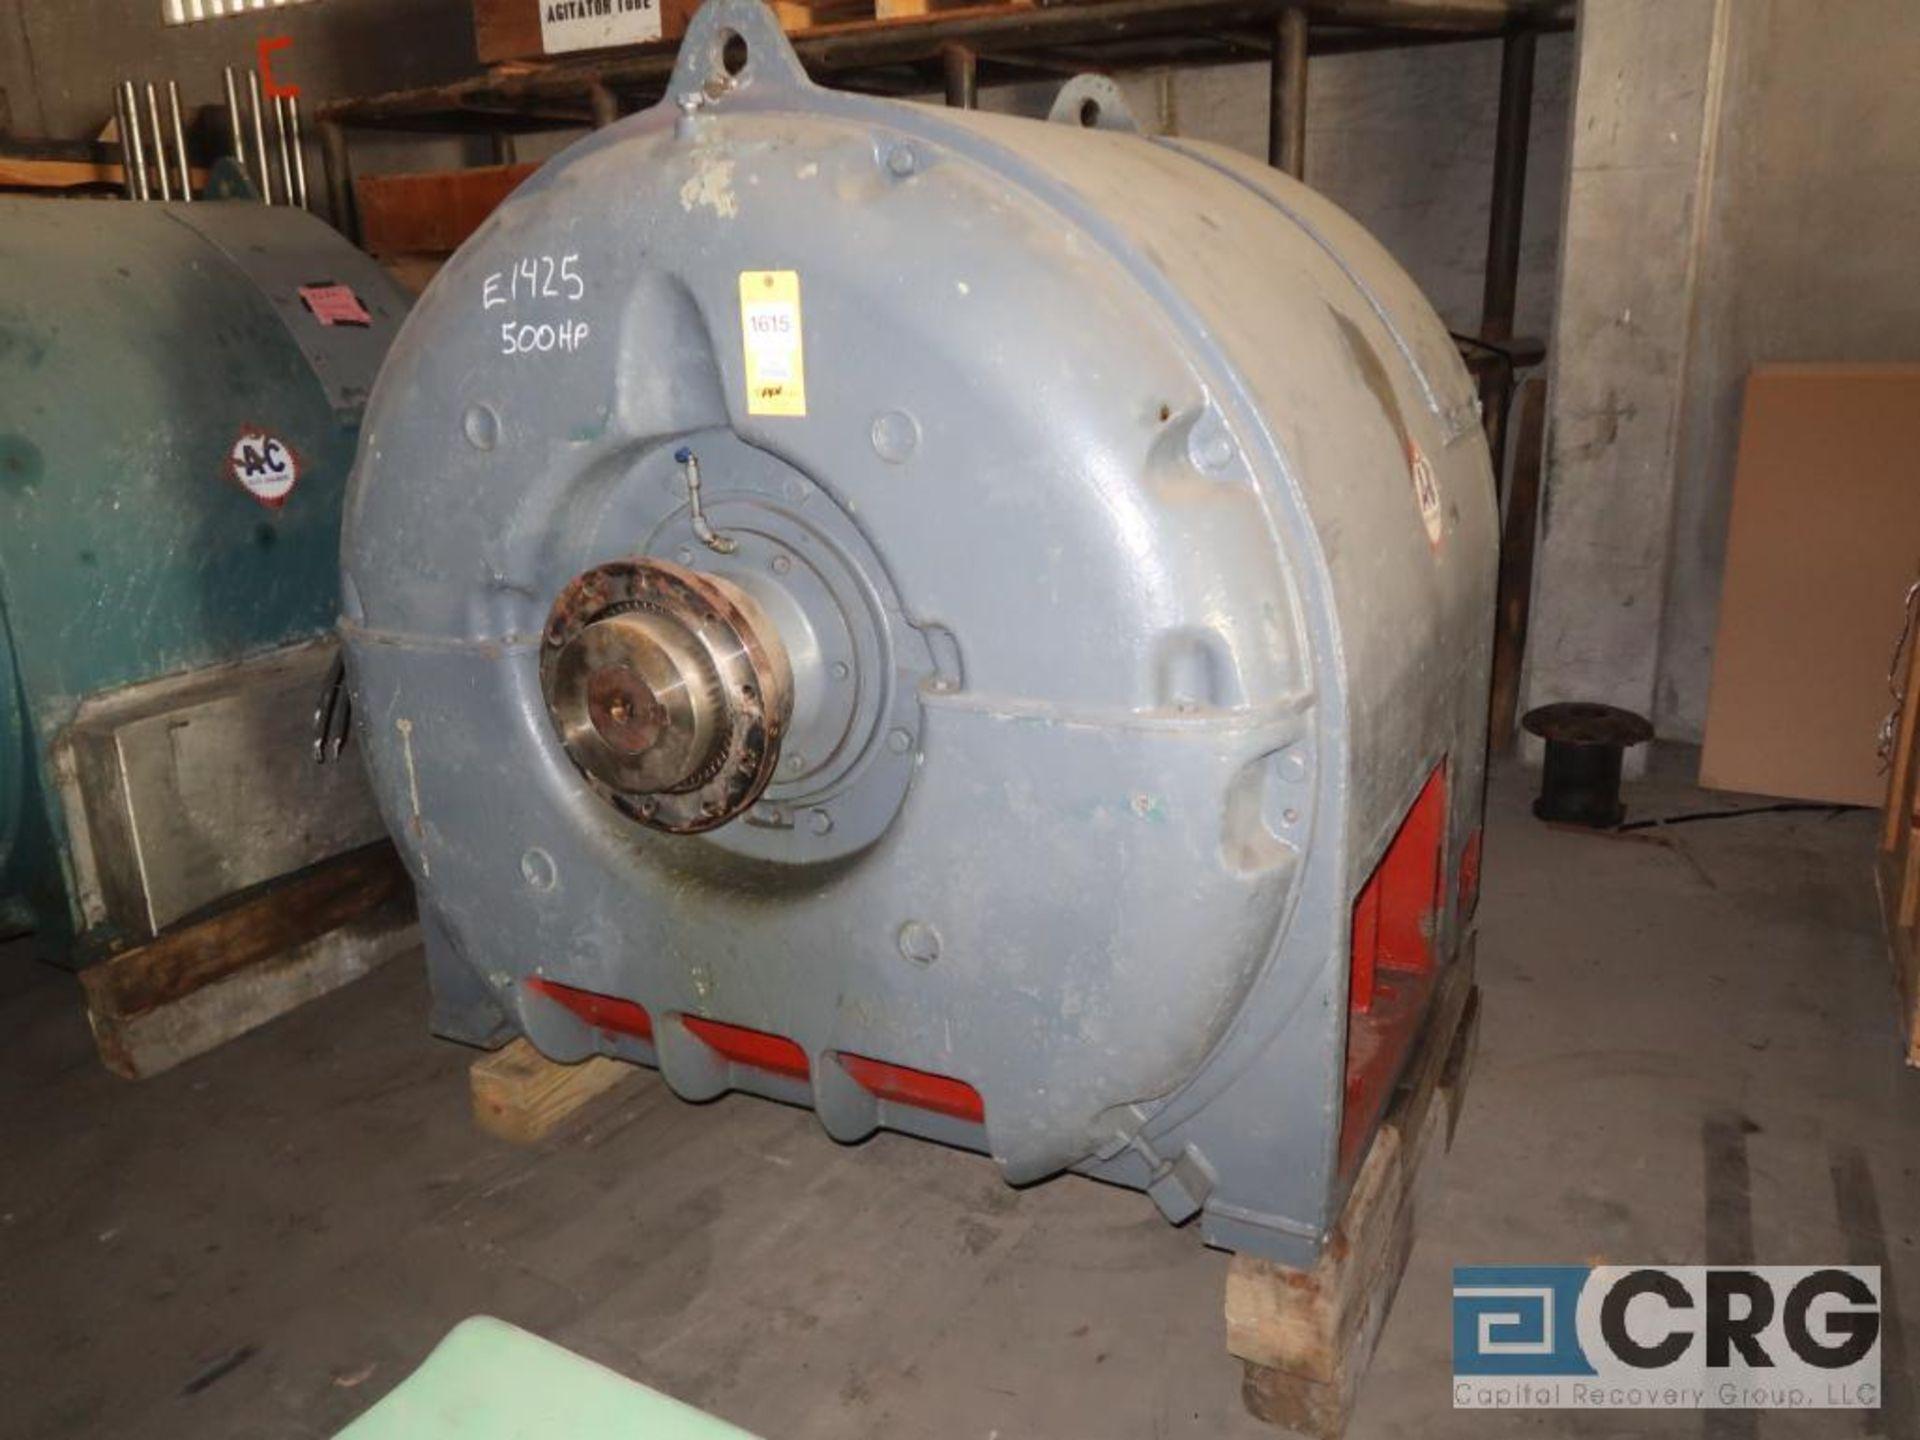 Allis Chalmers 500 HP motor, 2,300 volt, 3 ph., 514 RPM, s/n 160972 (Off Site Warehouse)